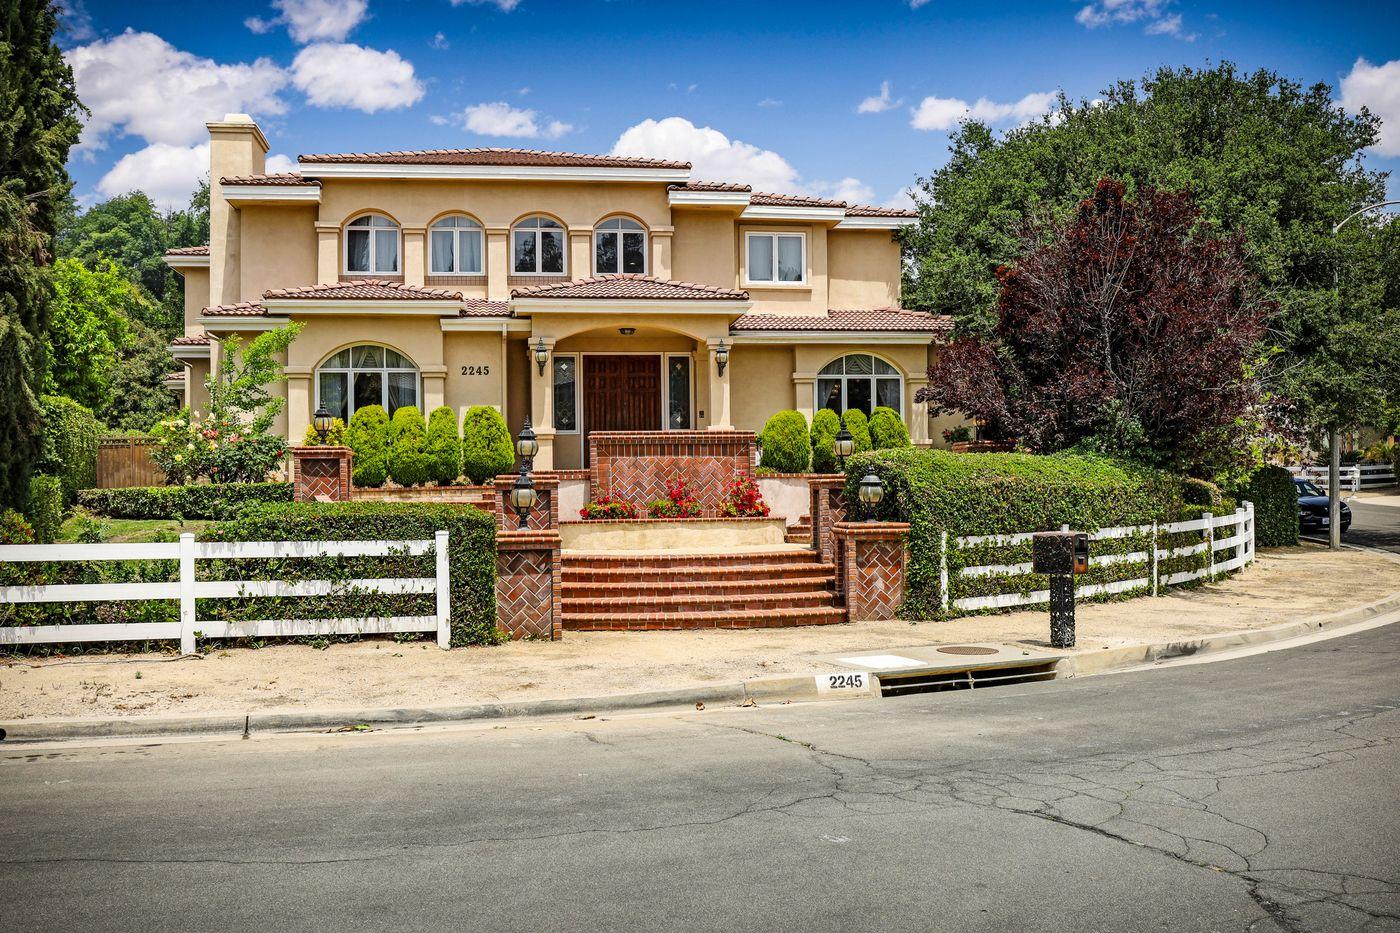 real-estate-photography-2245 Kingsbridge Ct-San Dimas-91773-airbnb-rental-interior-design-photographer-kasi-hyrapett-4